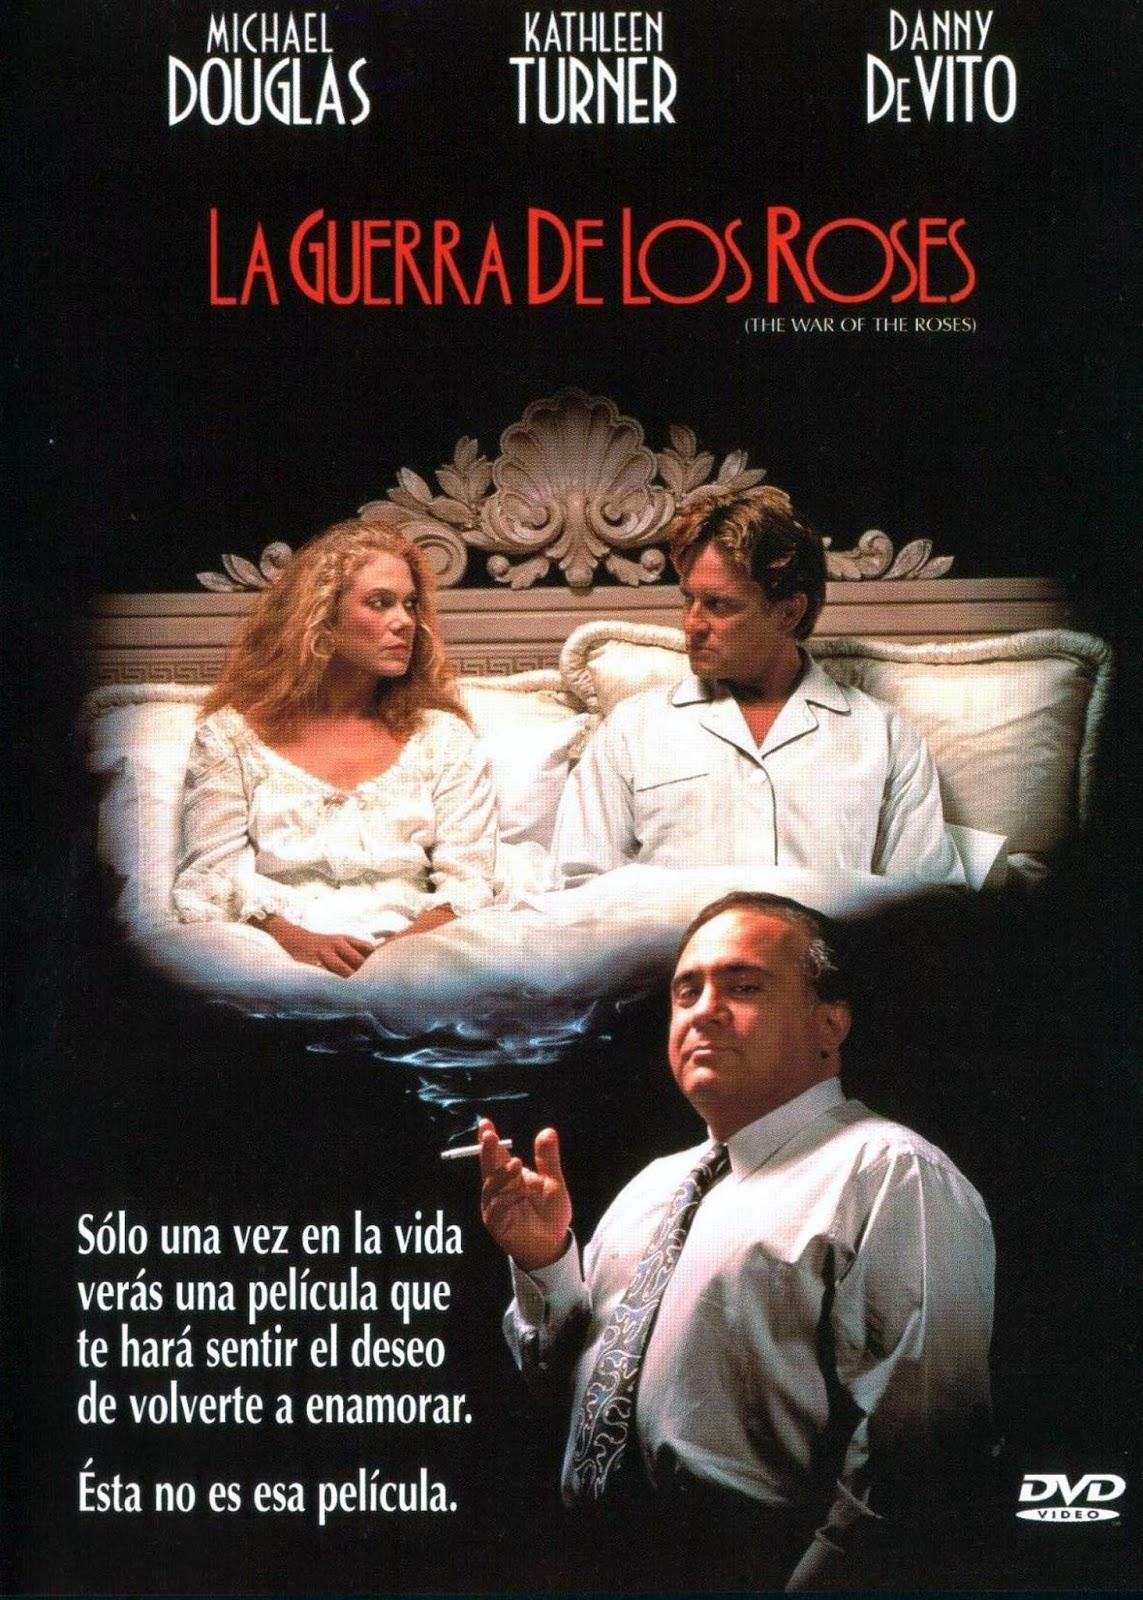 La guerra de los Roses (1989)